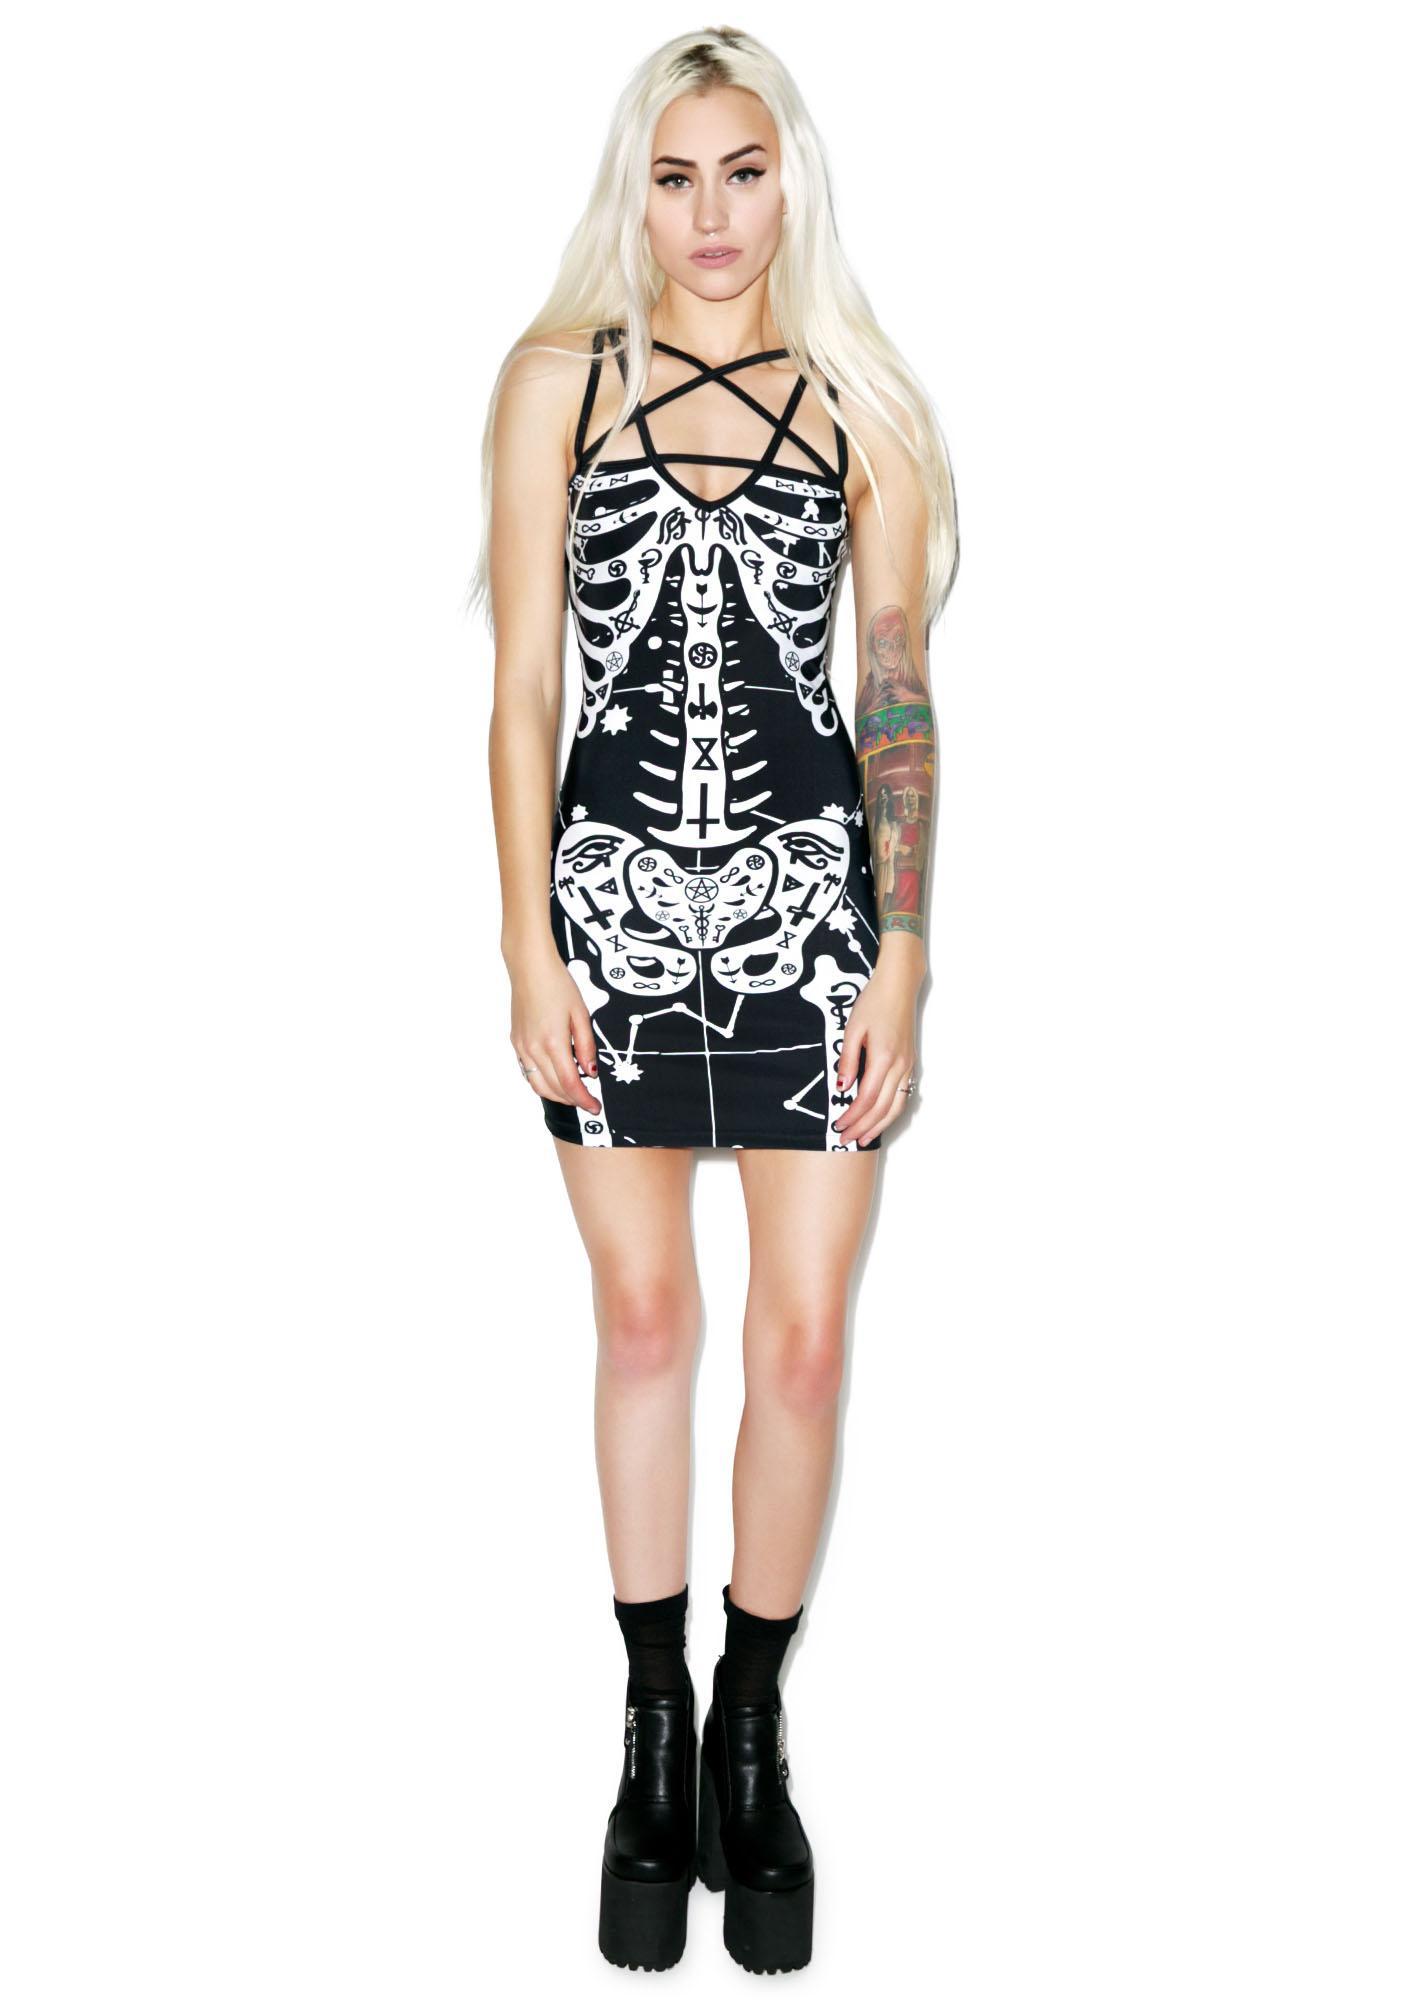 Occult Bones Pentagram Dress